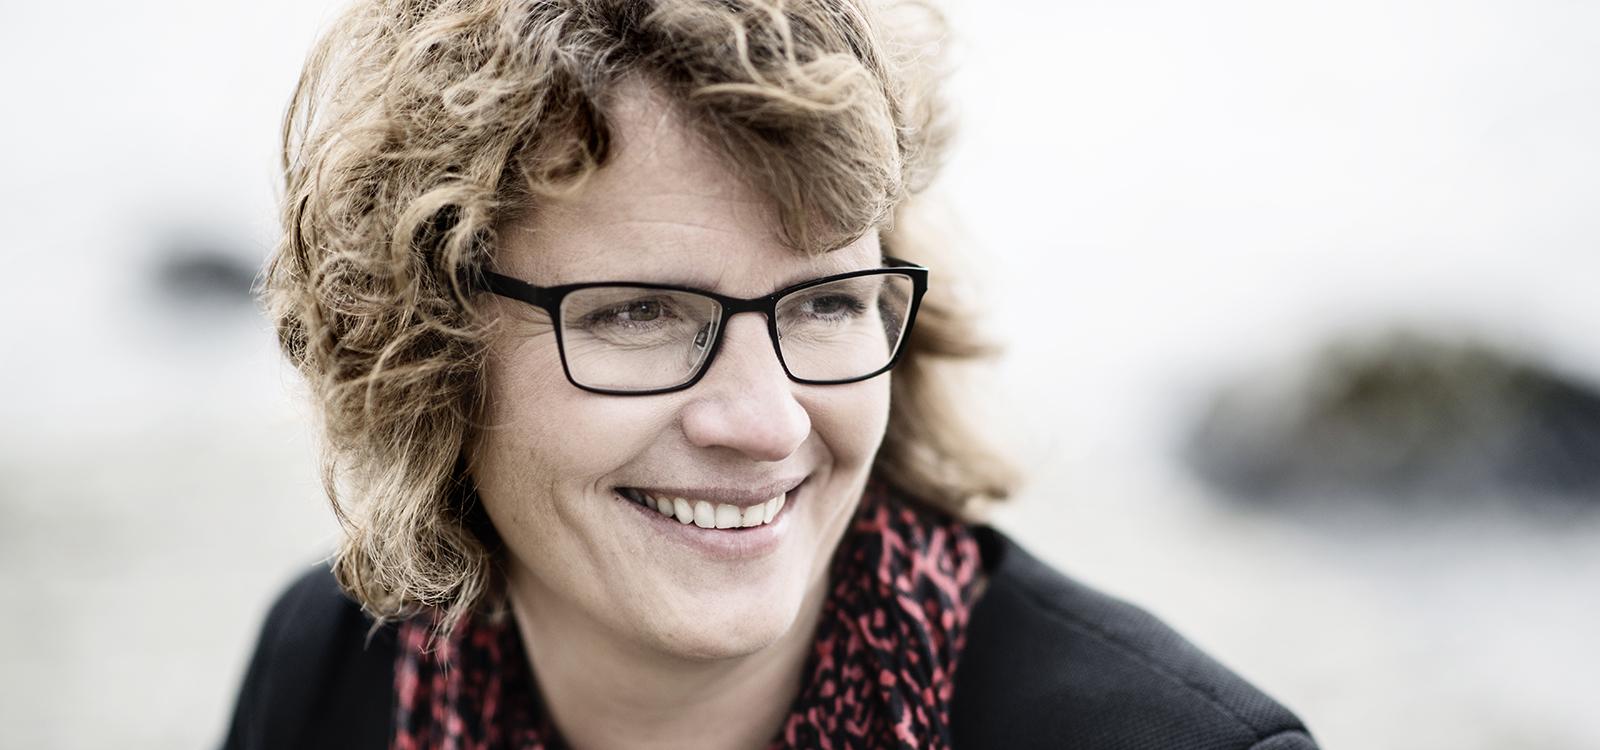 Ingrid Wiklund Lilja